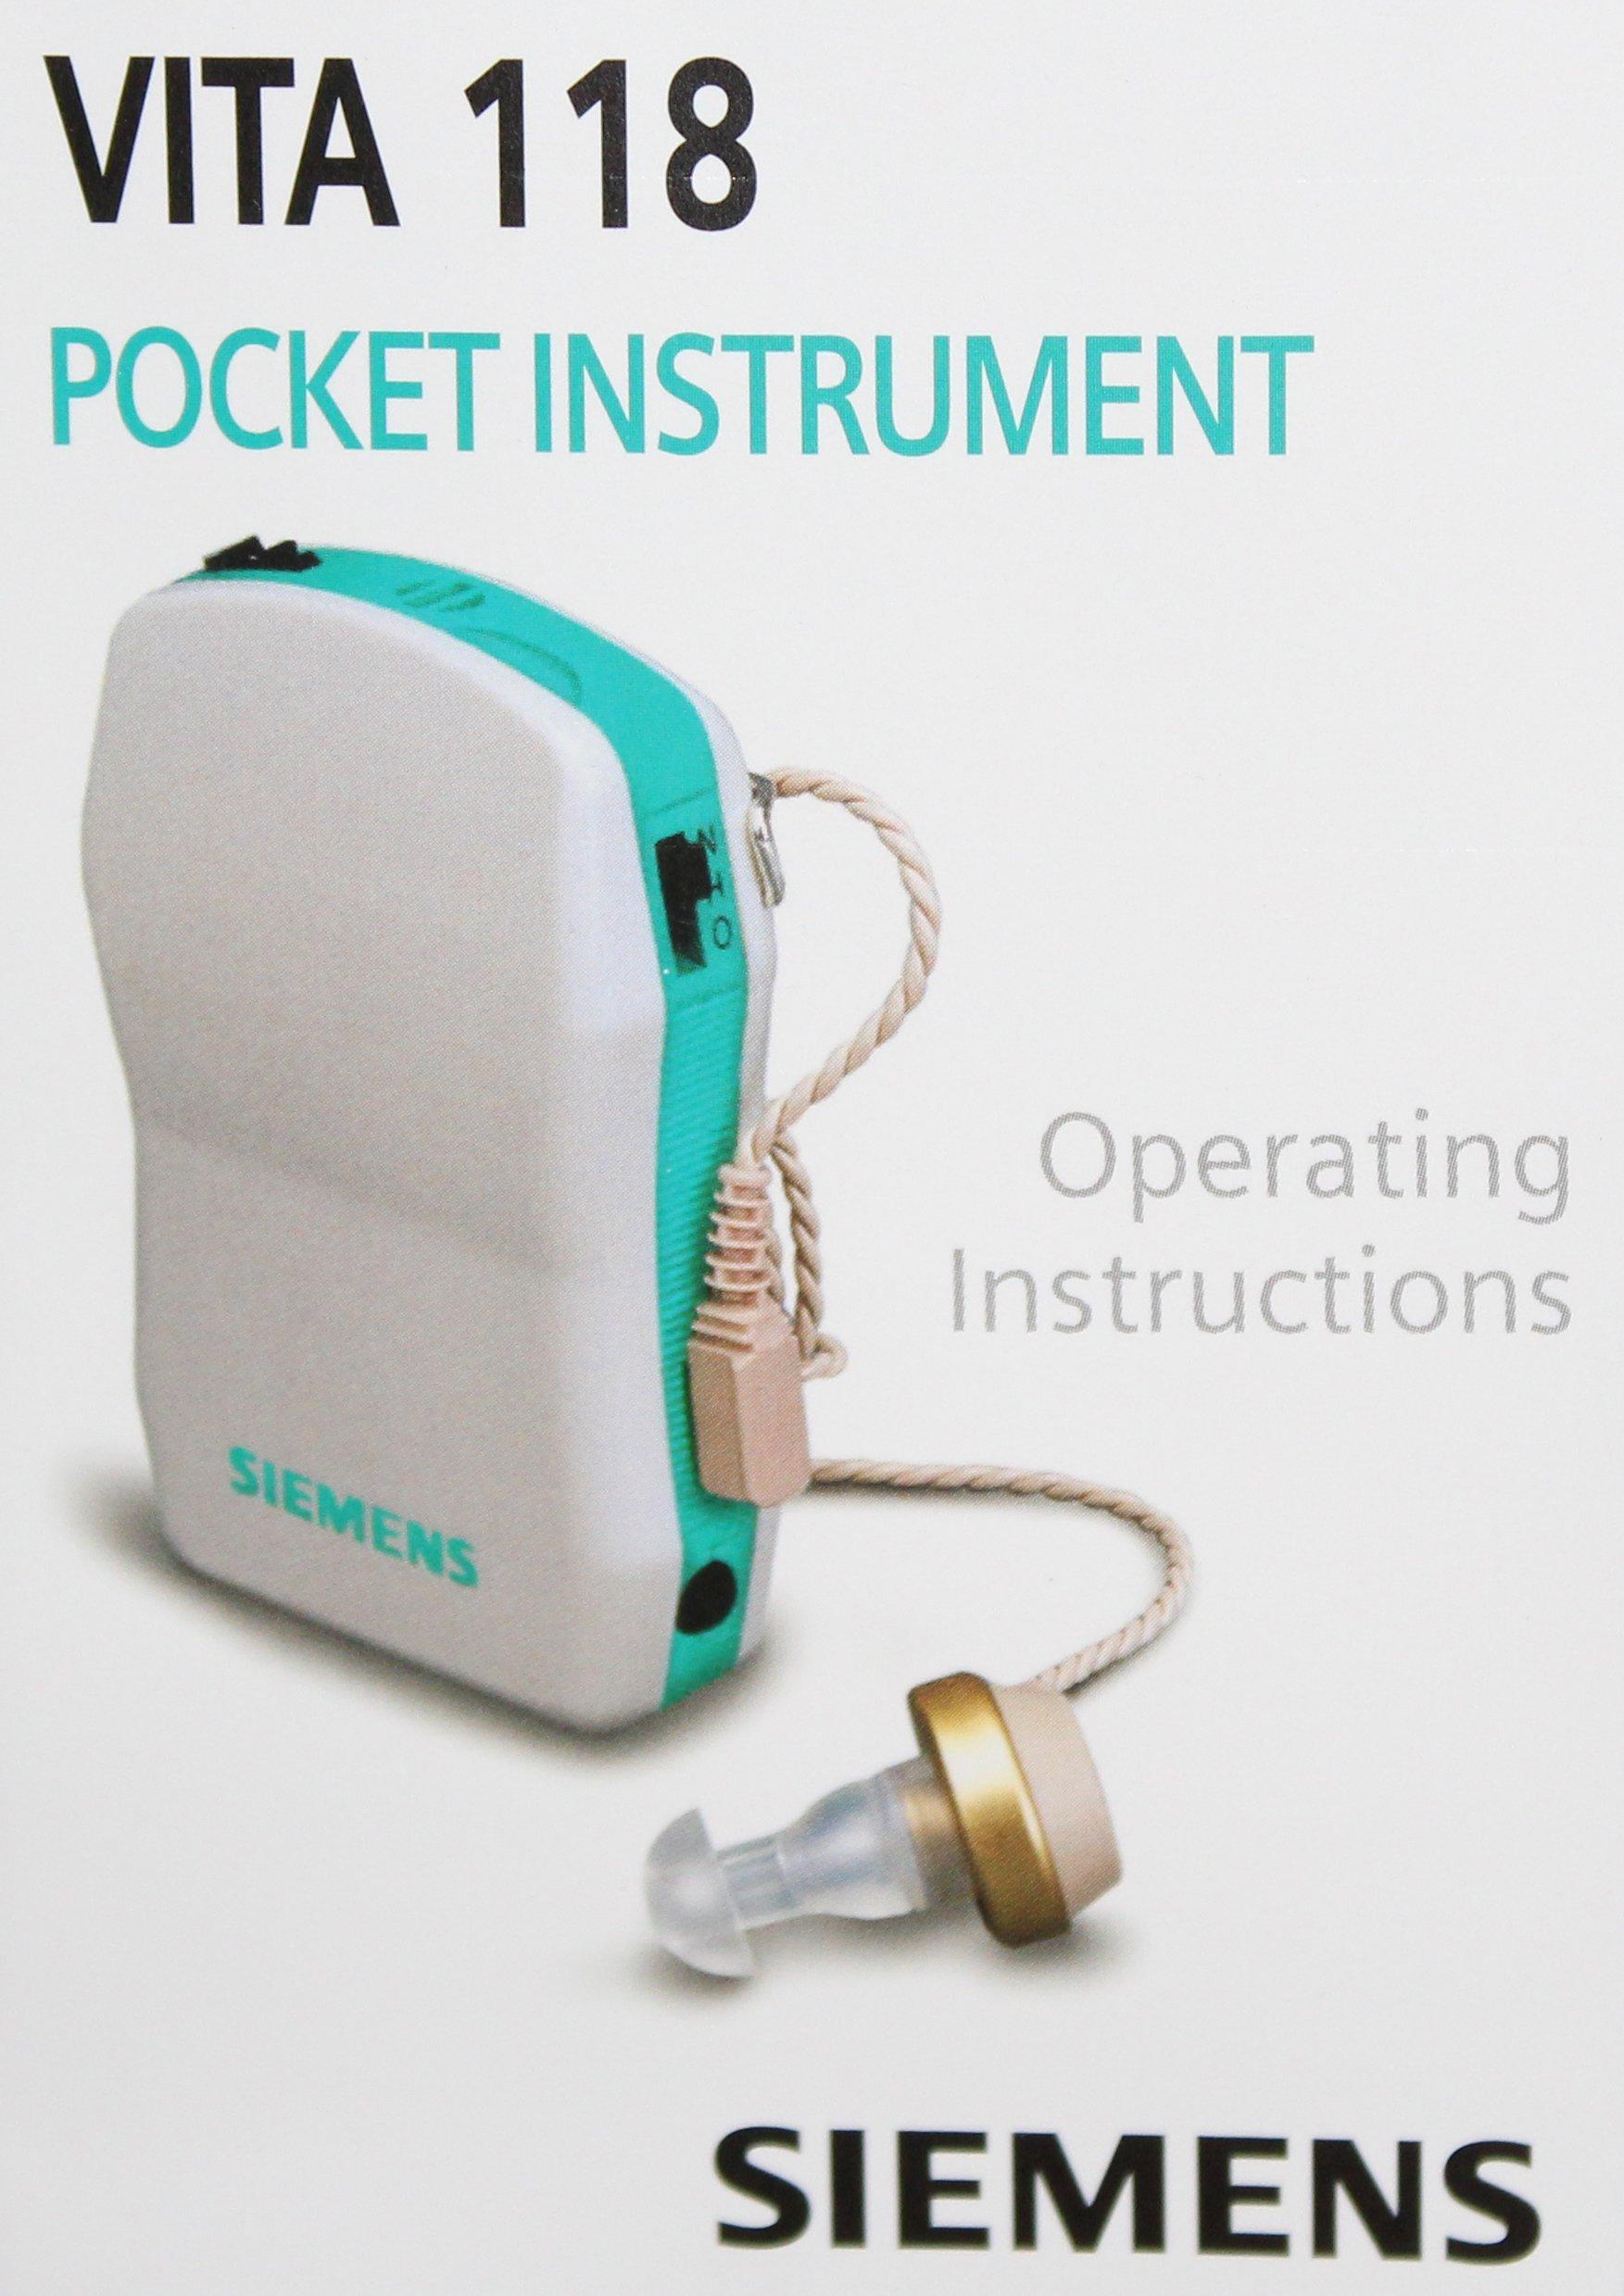 Siemens Vita 118 Pocket Hearing Instrument Hearing Amplifier by Siemens